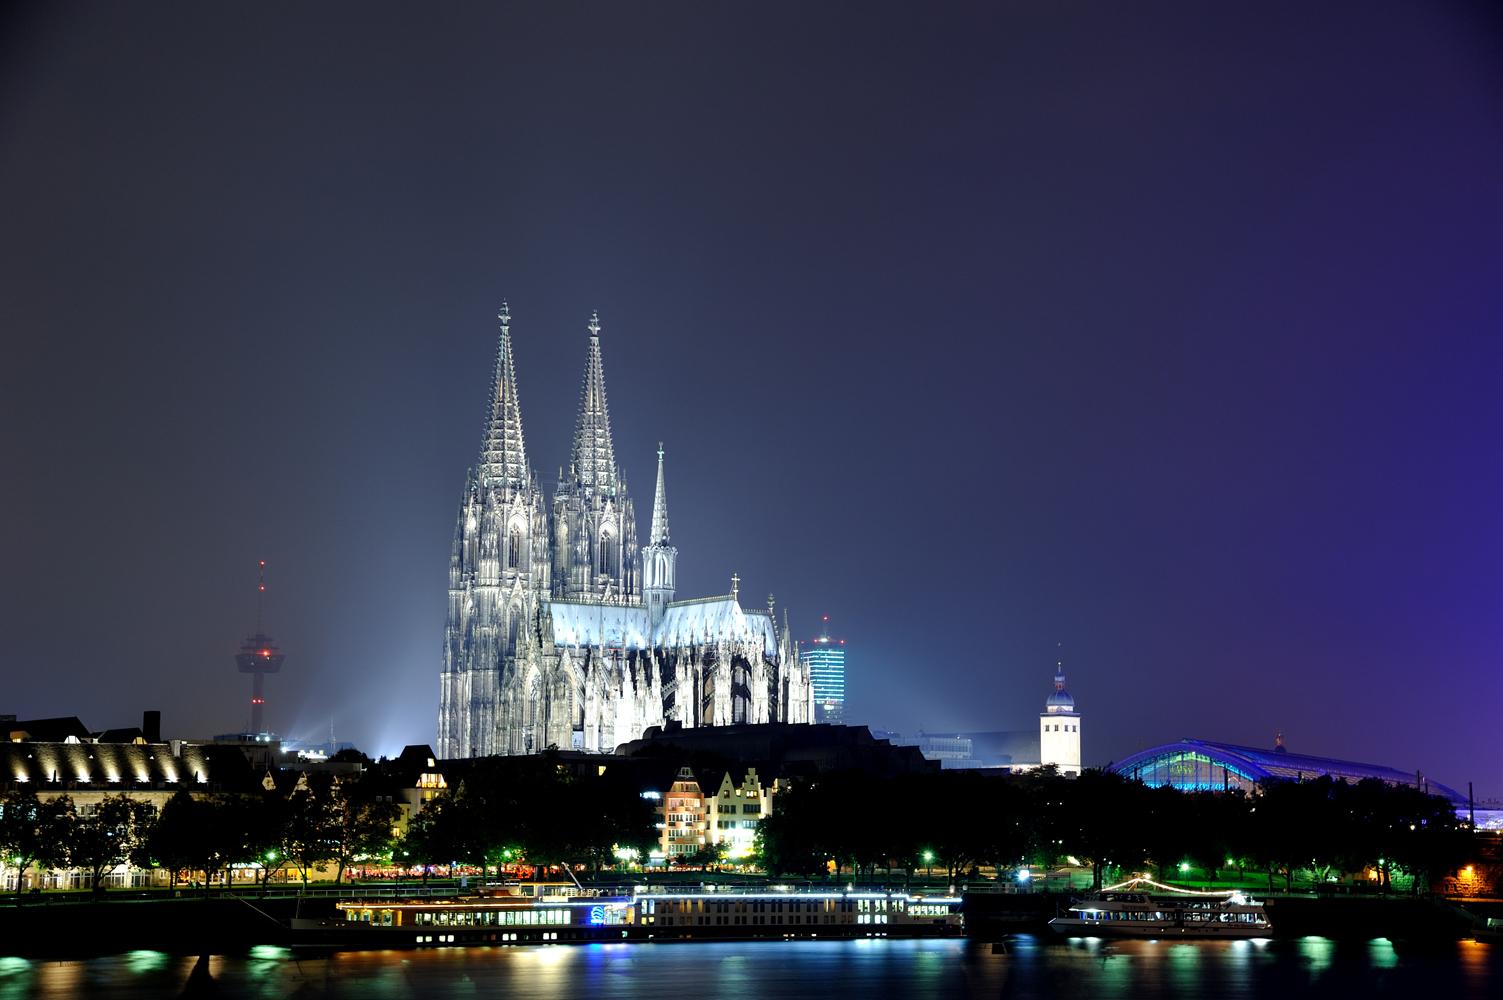 Nachtfotokurs am 5.10.2013 in Köln (2)